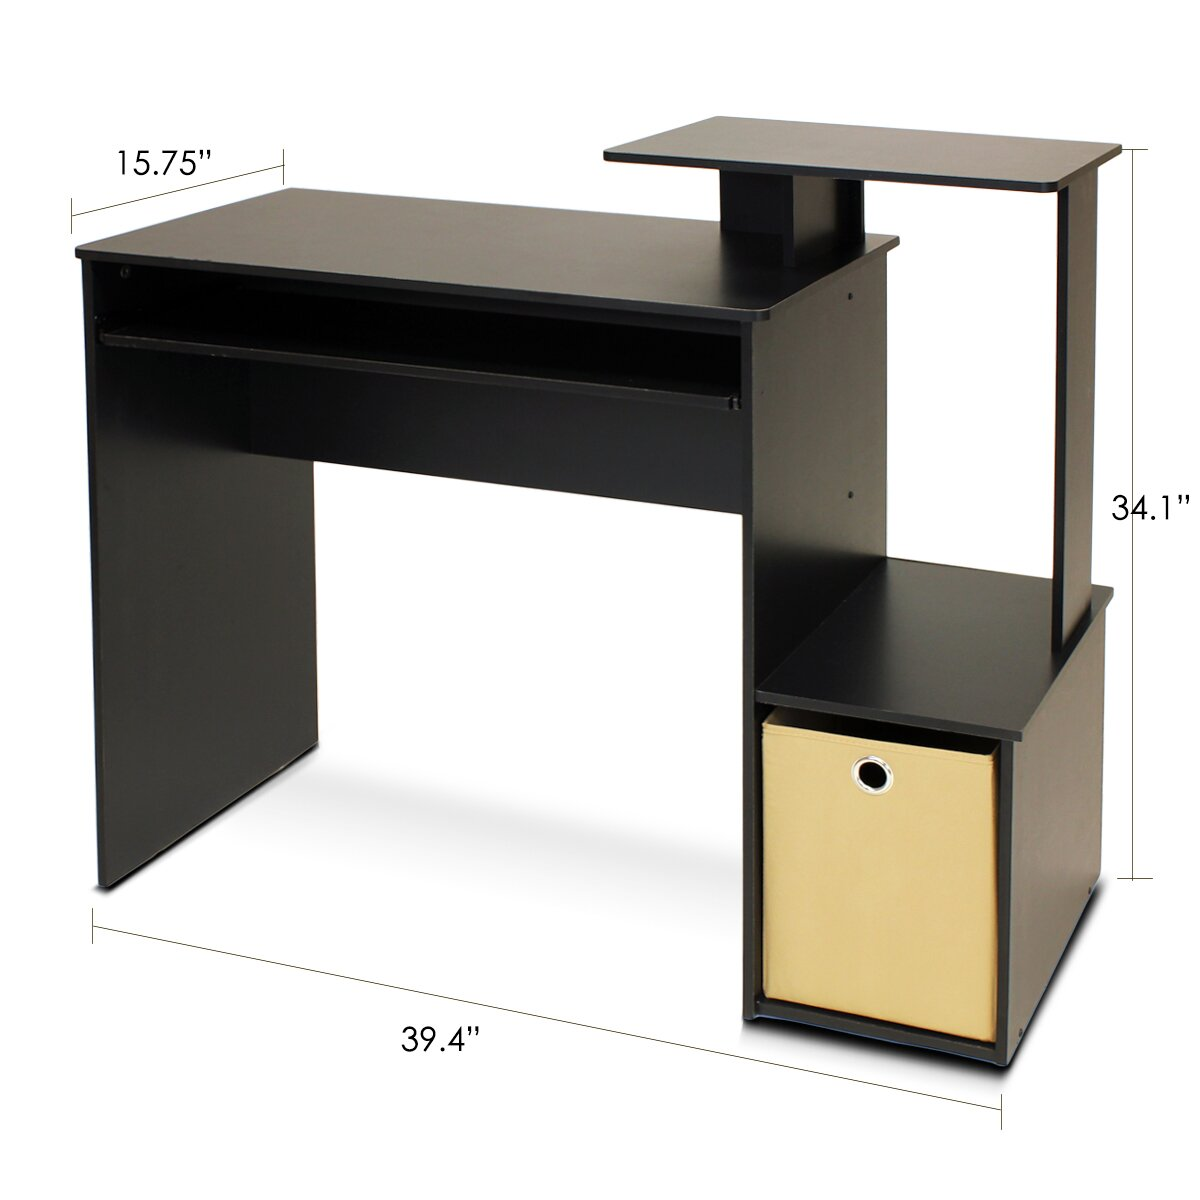 Wildon home home office computer desk reviews wayfair for Computer office desks home